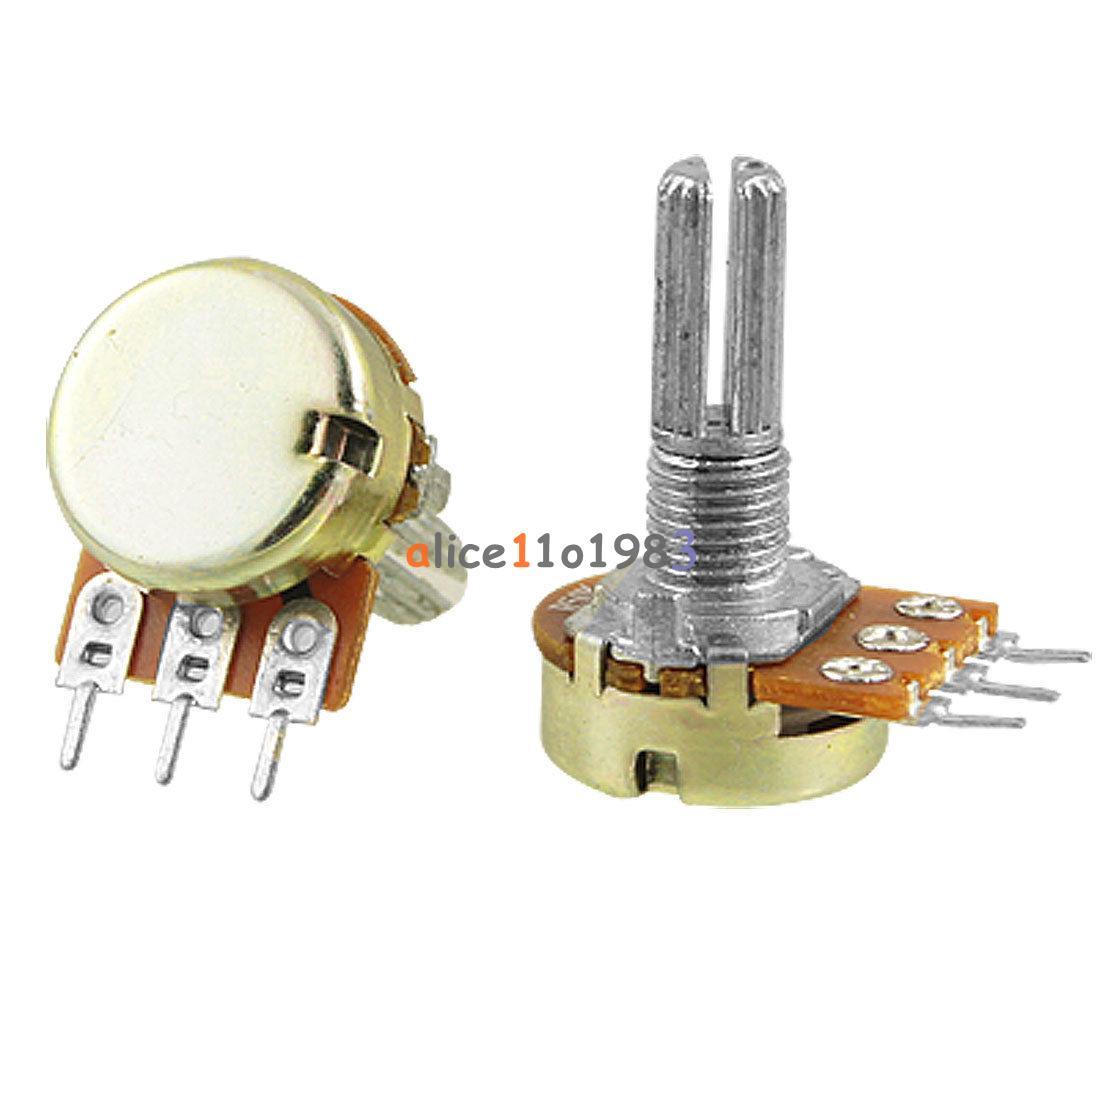 100 x B100K 100K Ohm Linear Taper Rotary Potentiometer Pot 15mm Shaft Handle